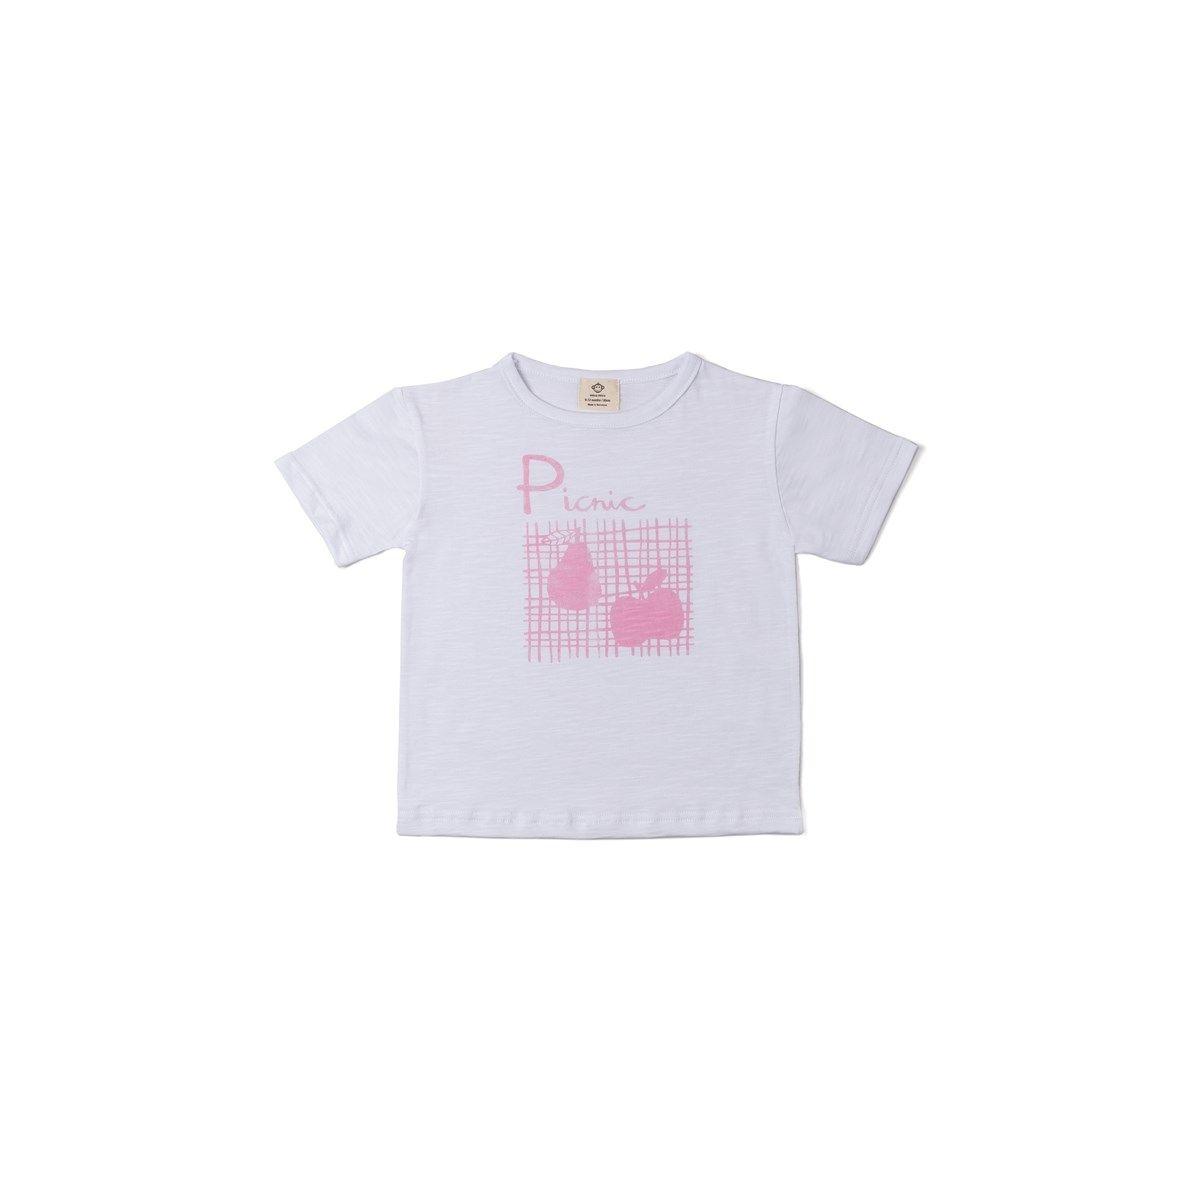 T-shirt coton bio PICNIC